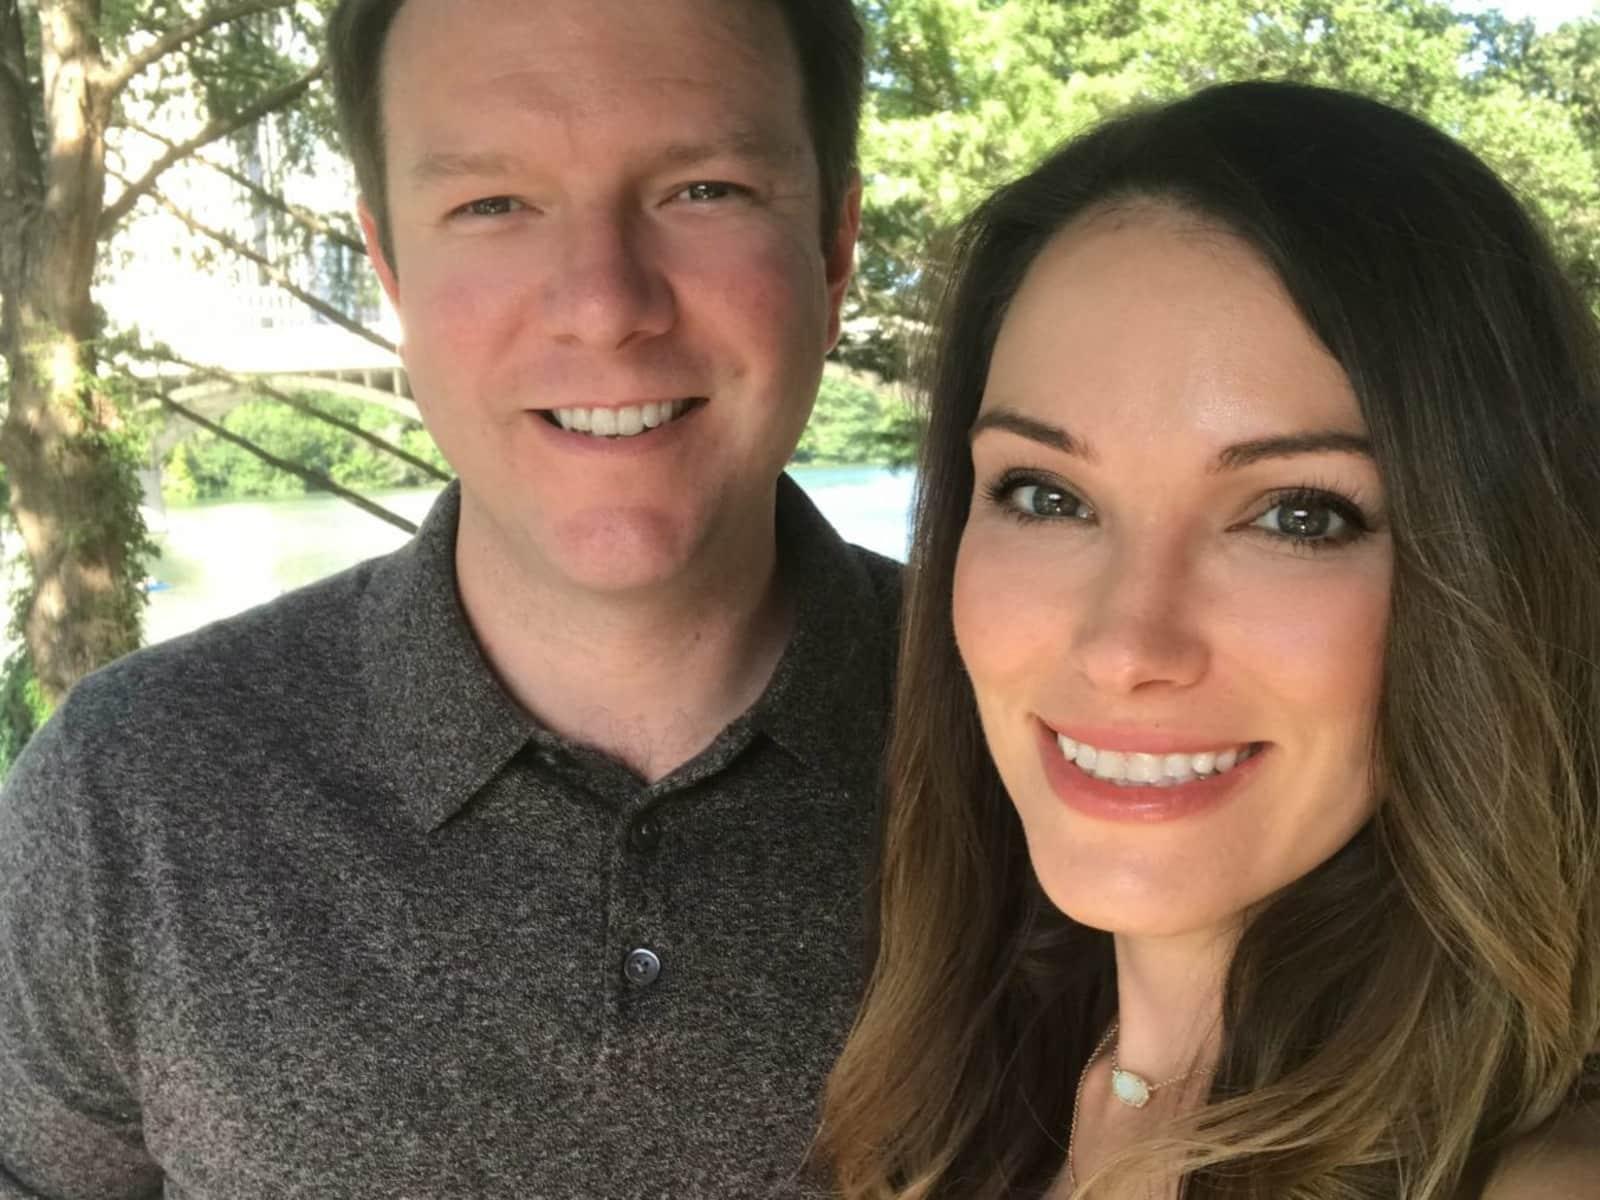 Danielle & Chris from Jenks, Oklahoma, United States